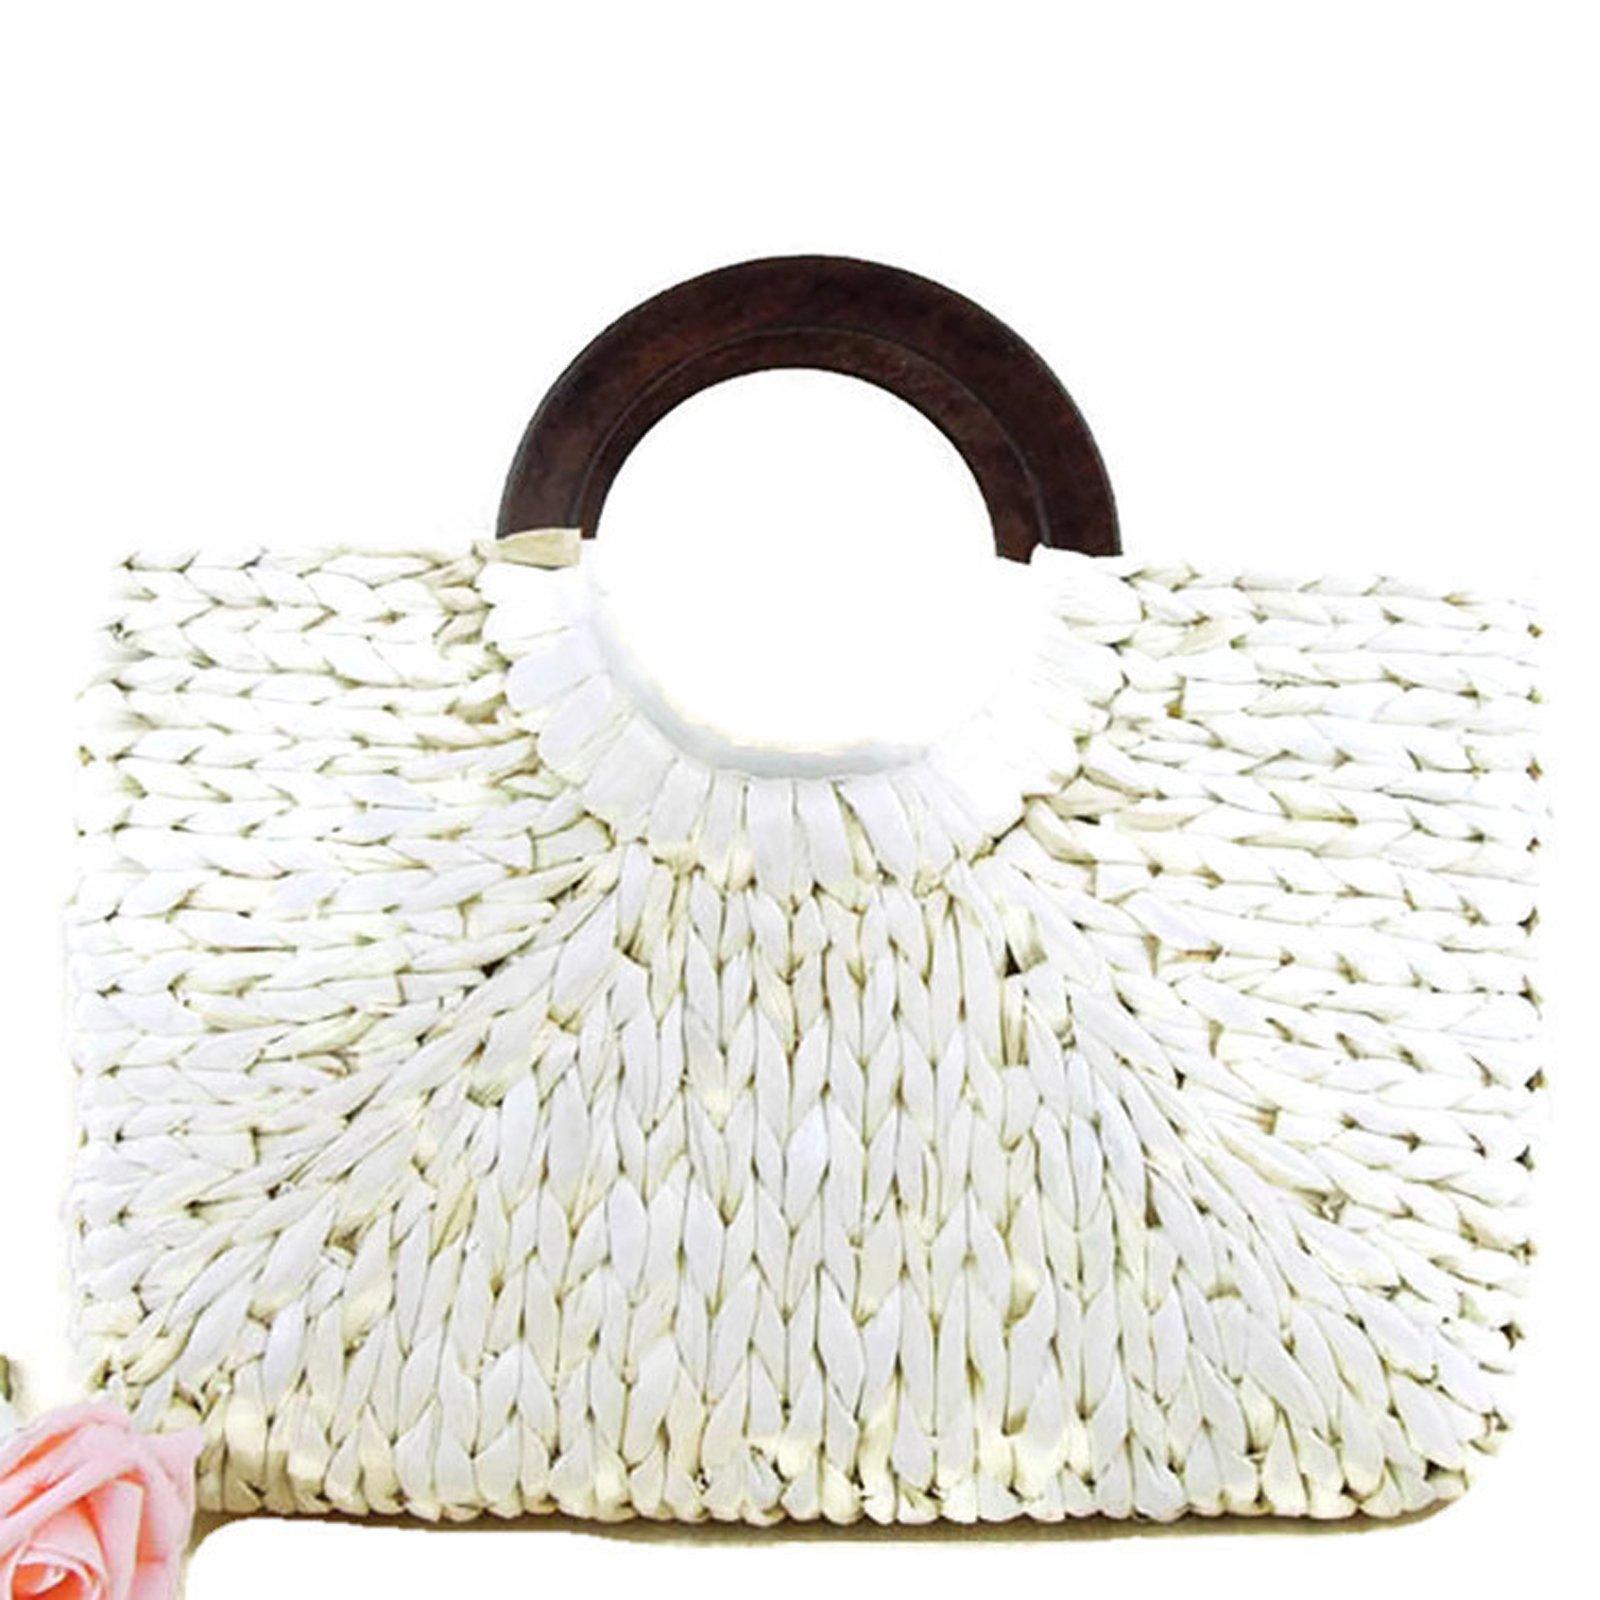 Top Handle Straw Handbag | Casual Women Satchel | Travel Tote | Everyday Large Bag (White)